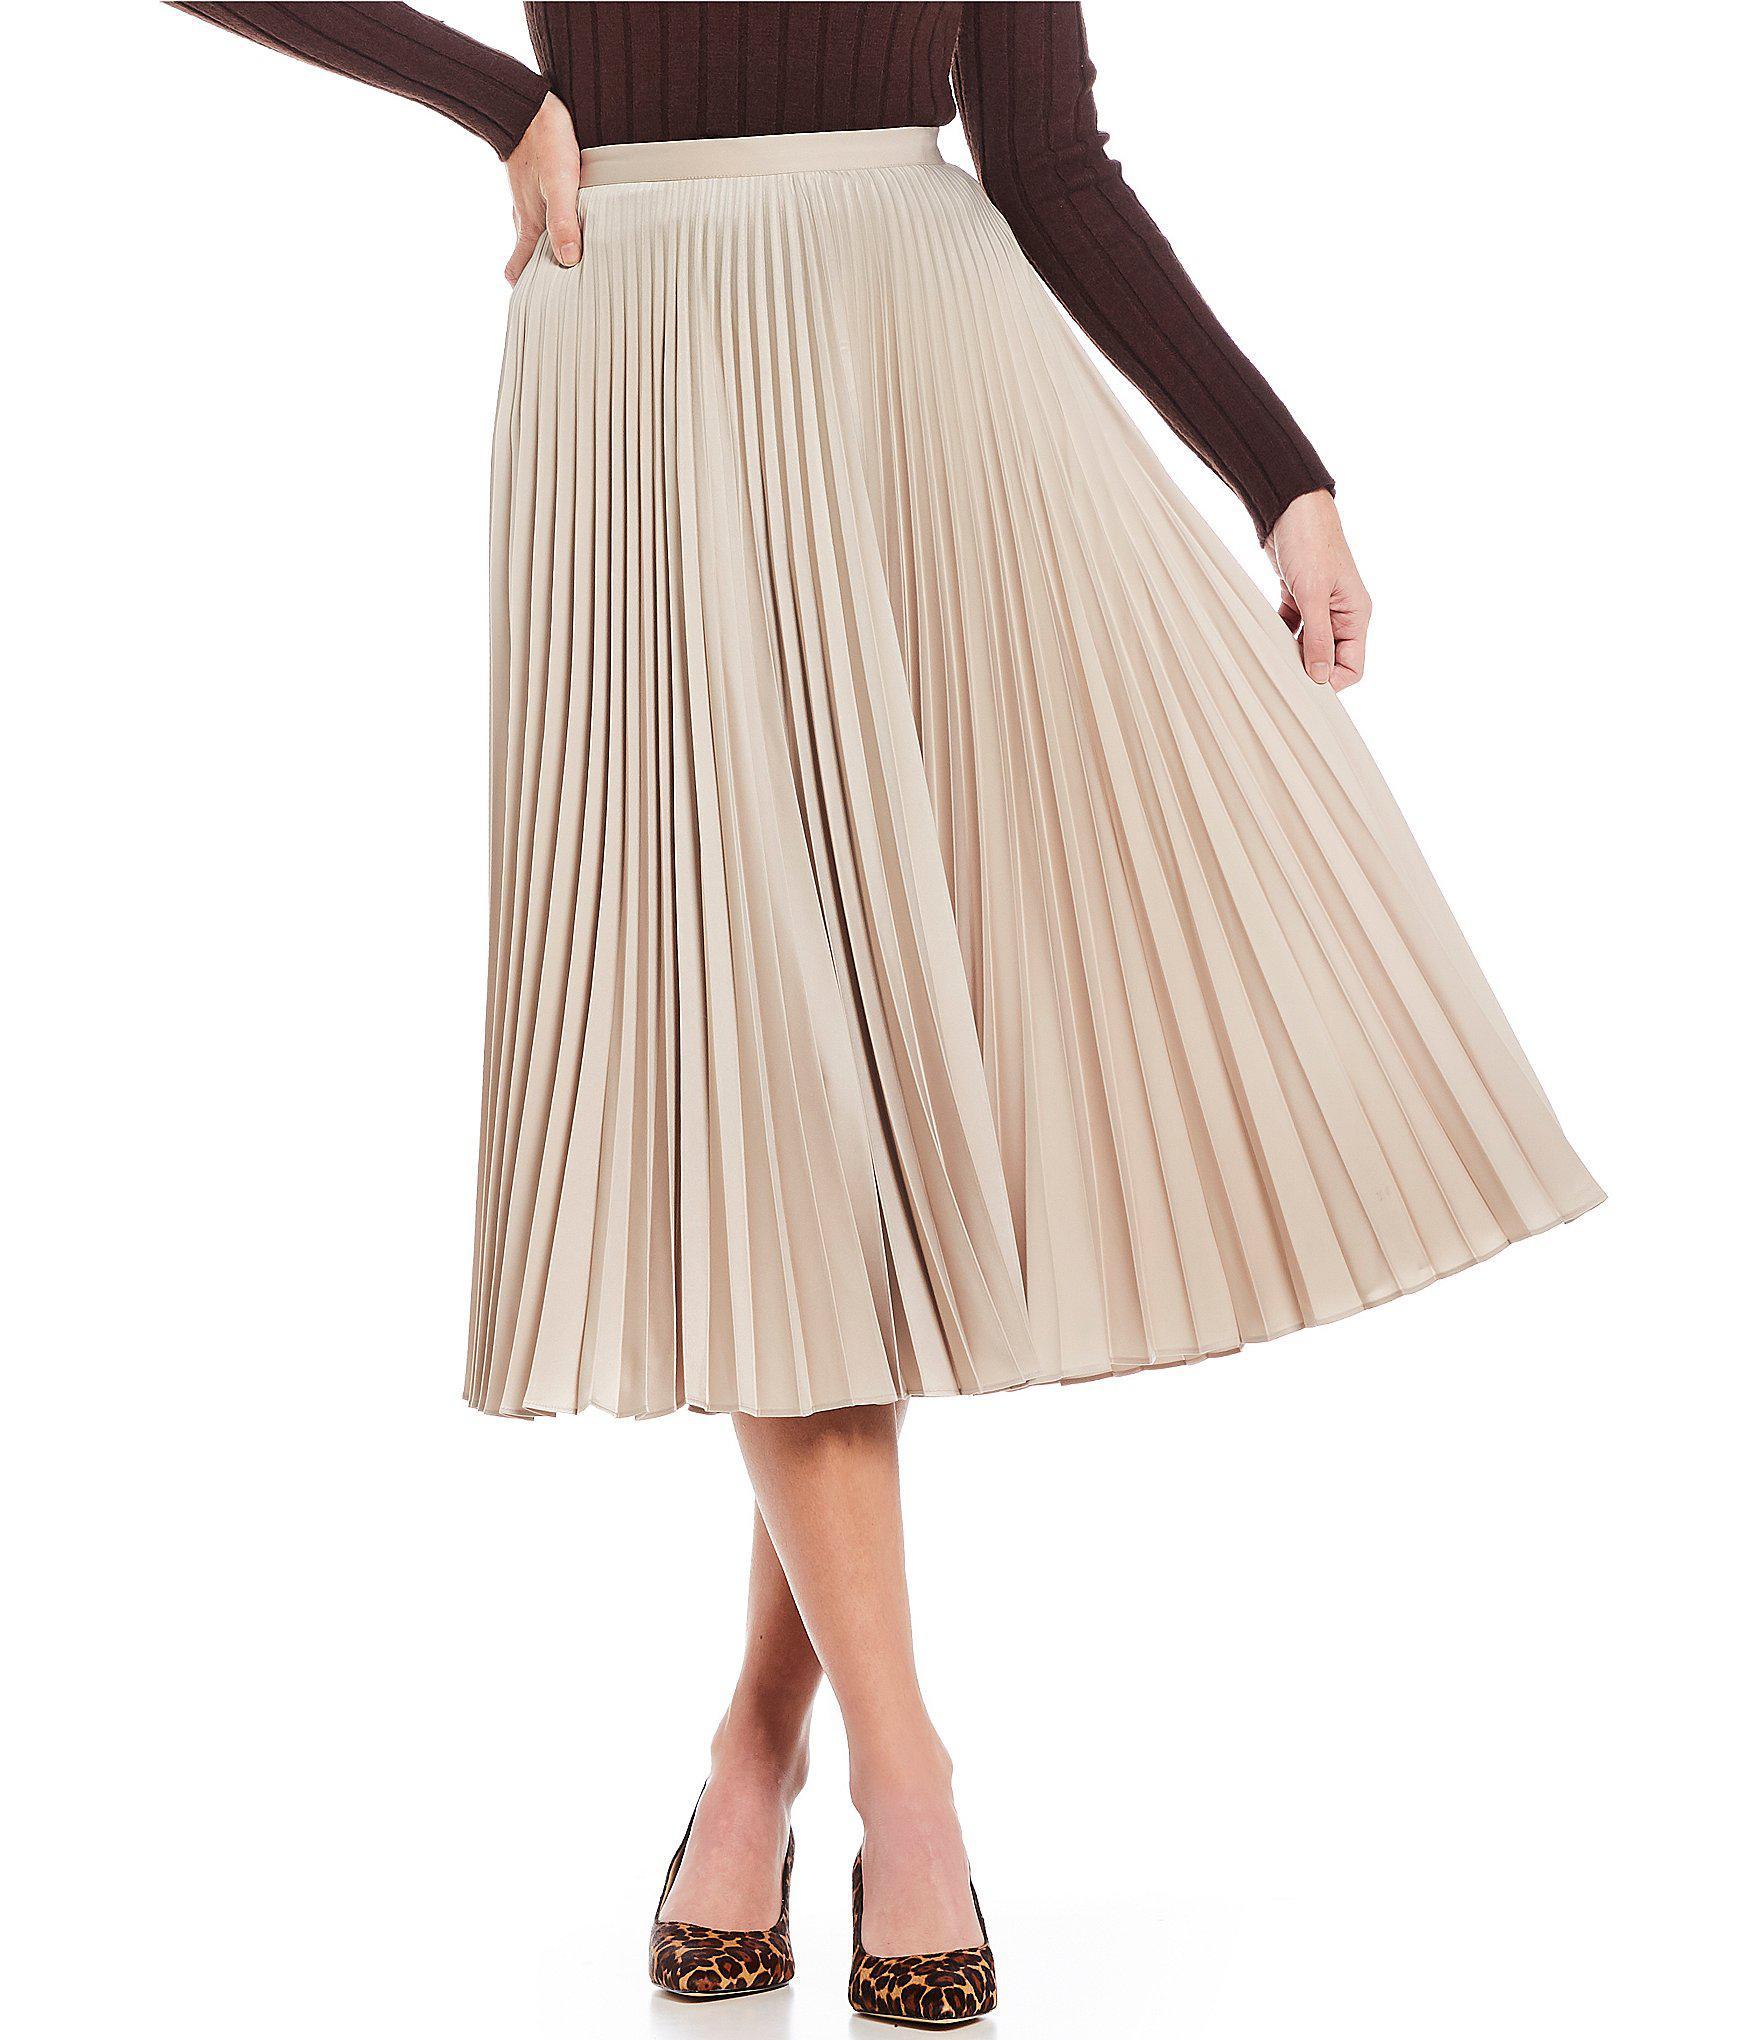 f9125cbac2 Gianni Bini Clara Accordion Pleated Midi Skirt in White - Lyst